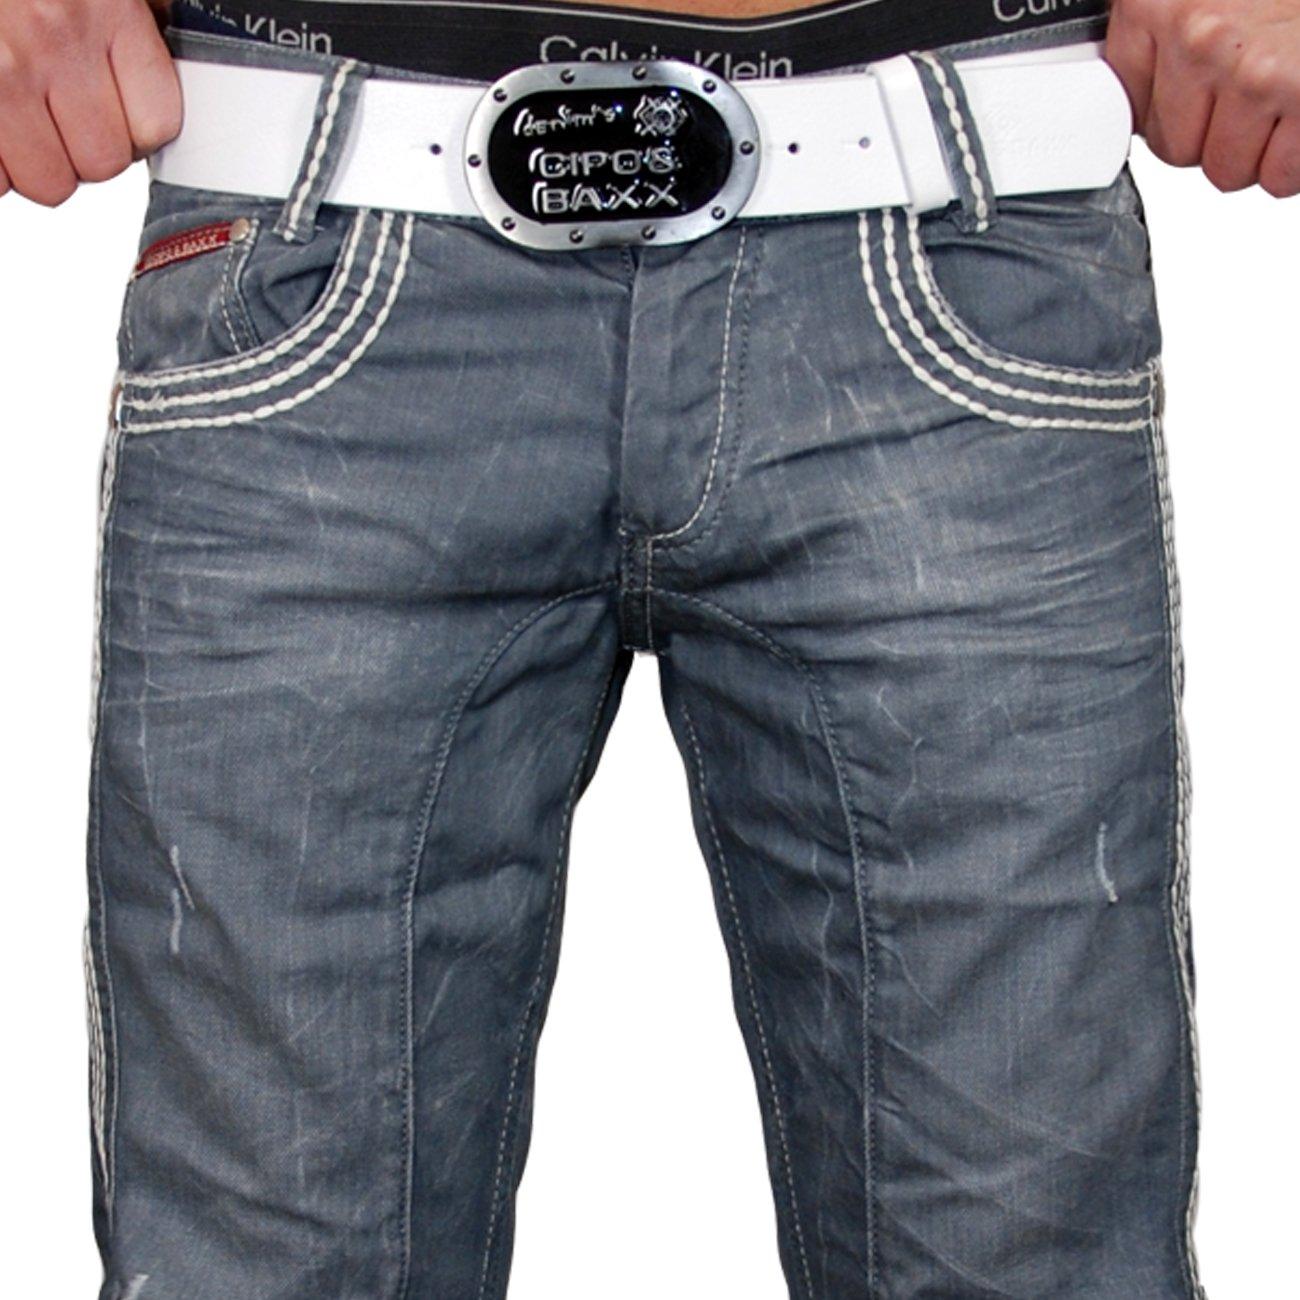 pin jeans cipo on pinterest. Black Bedroom Furniture Sets. Home Design Ideas